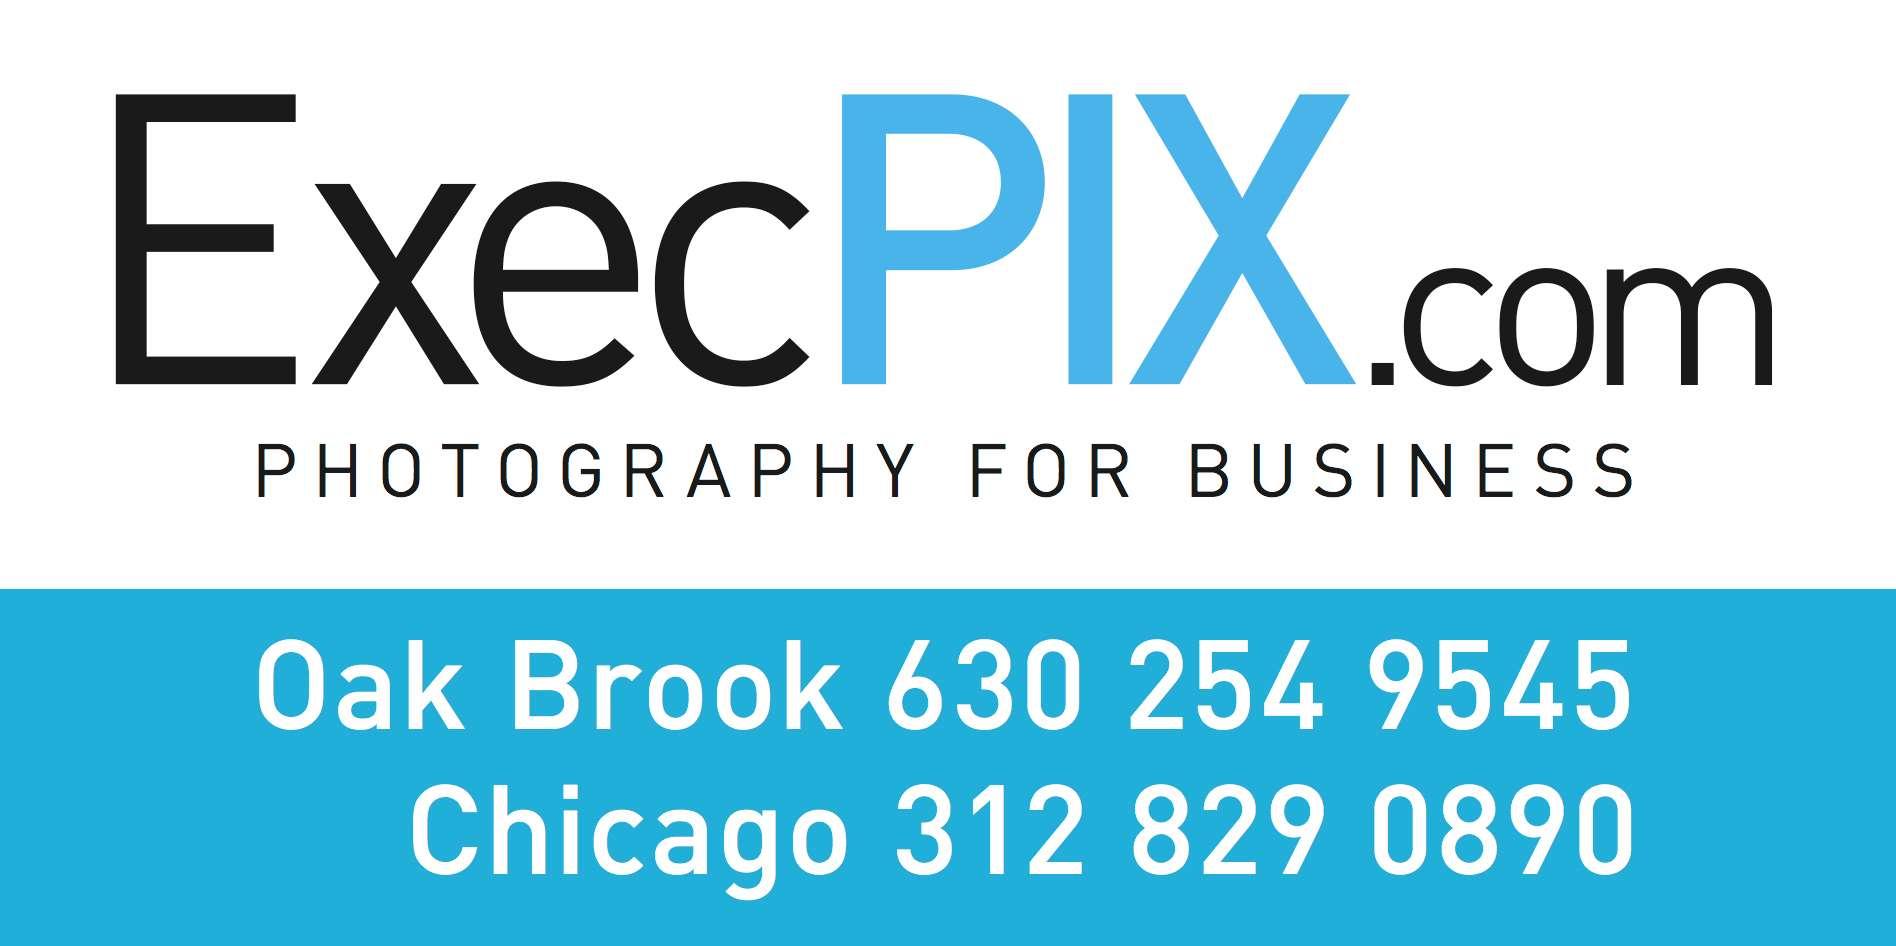 Matt Ferguson Photo & Video. / ExecPIX